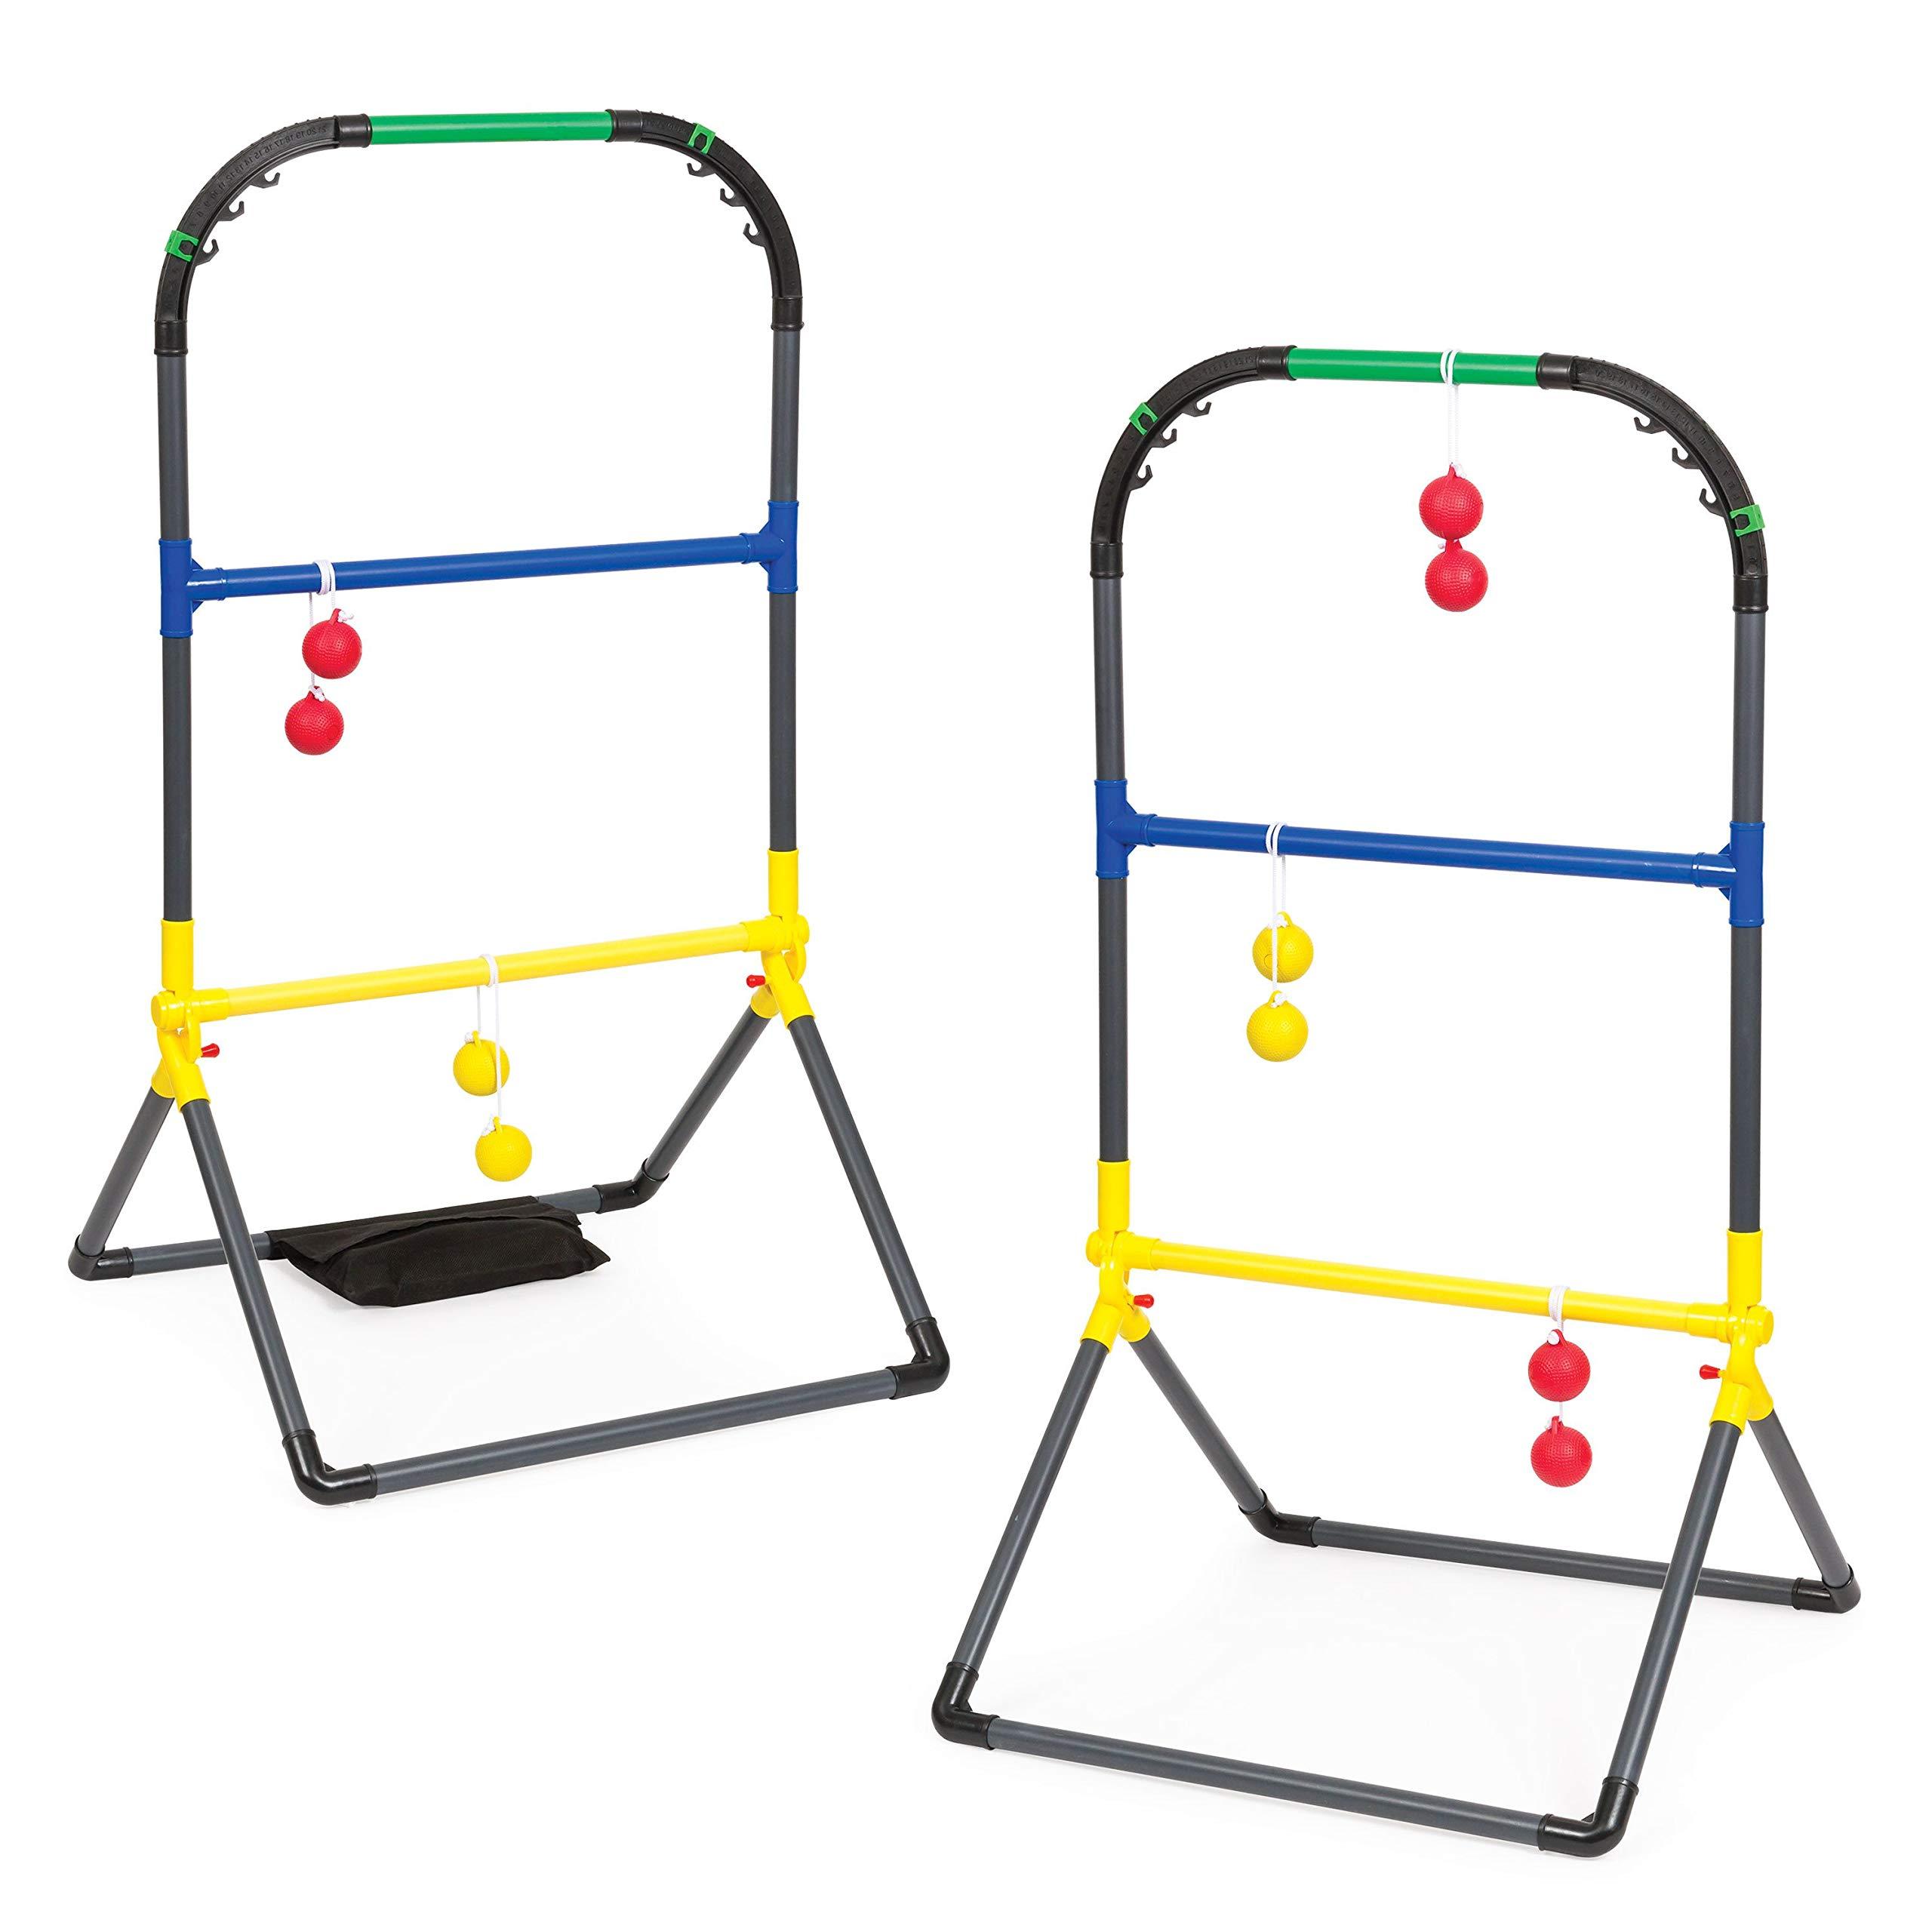 Aromzen Foldable Ladderball